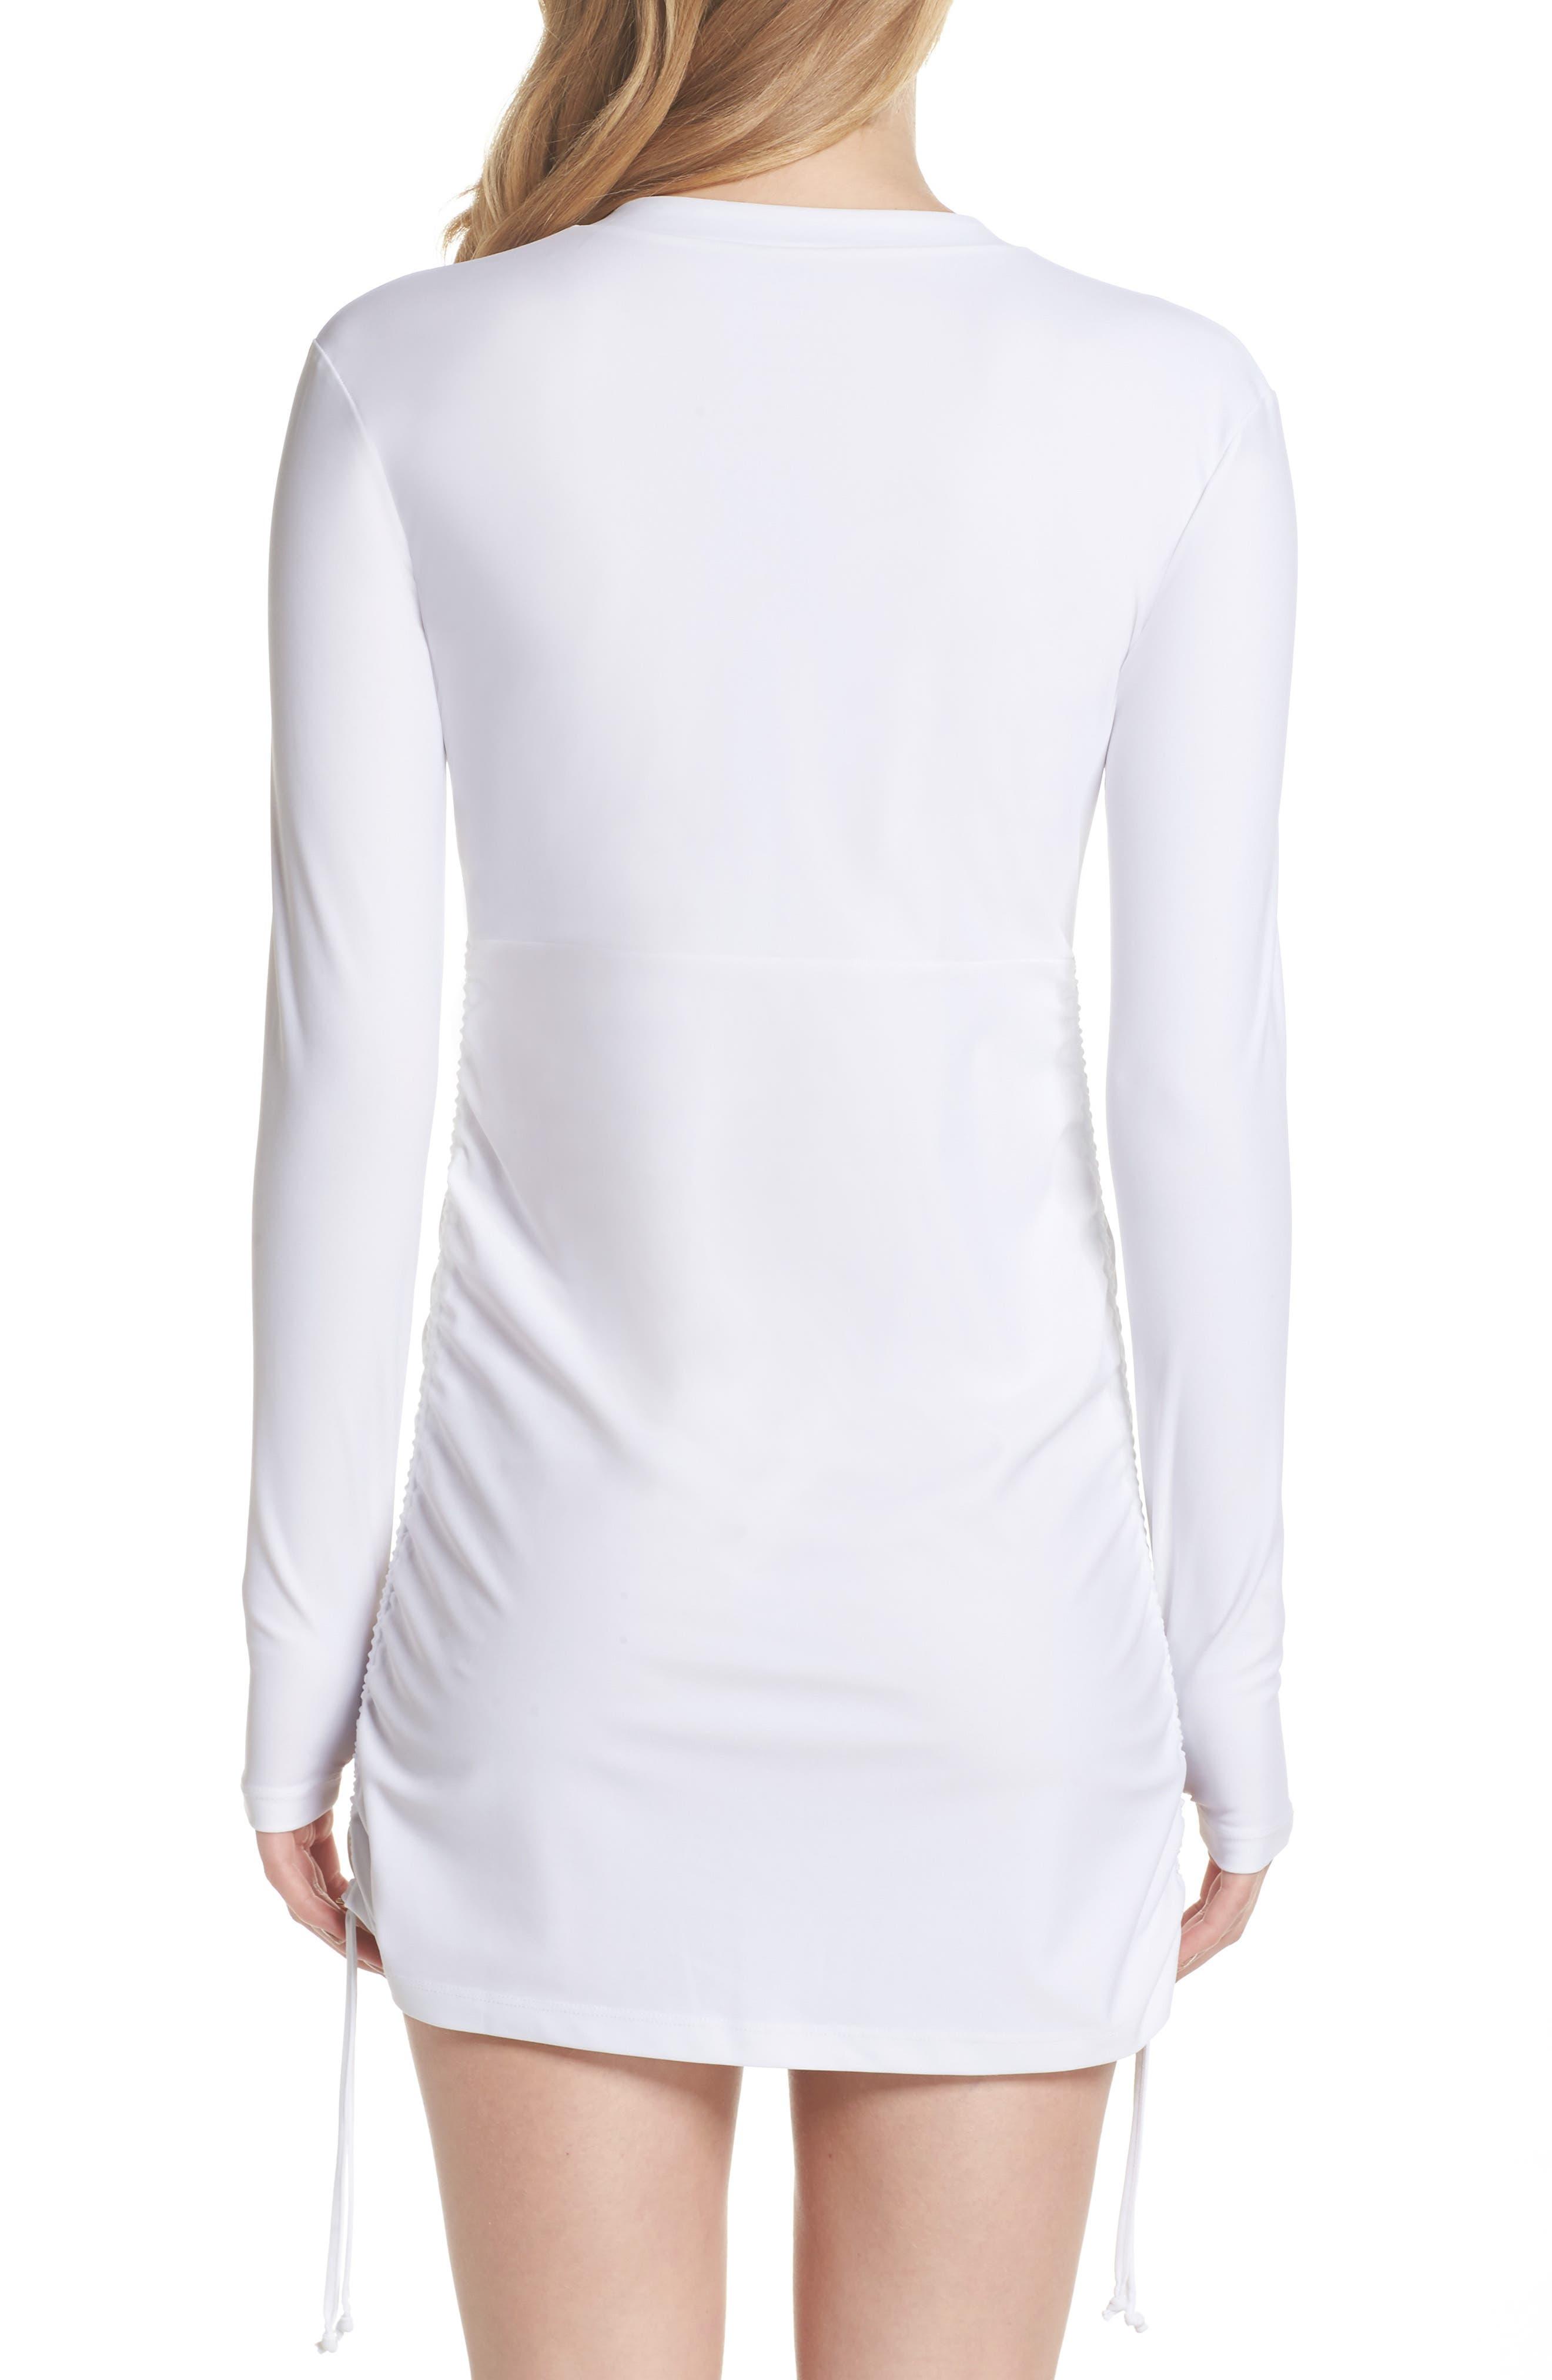 Sonja UPF 50 Cover-Up Swim Dress,                             Alternate thumbnail 2, color,                             WHITE